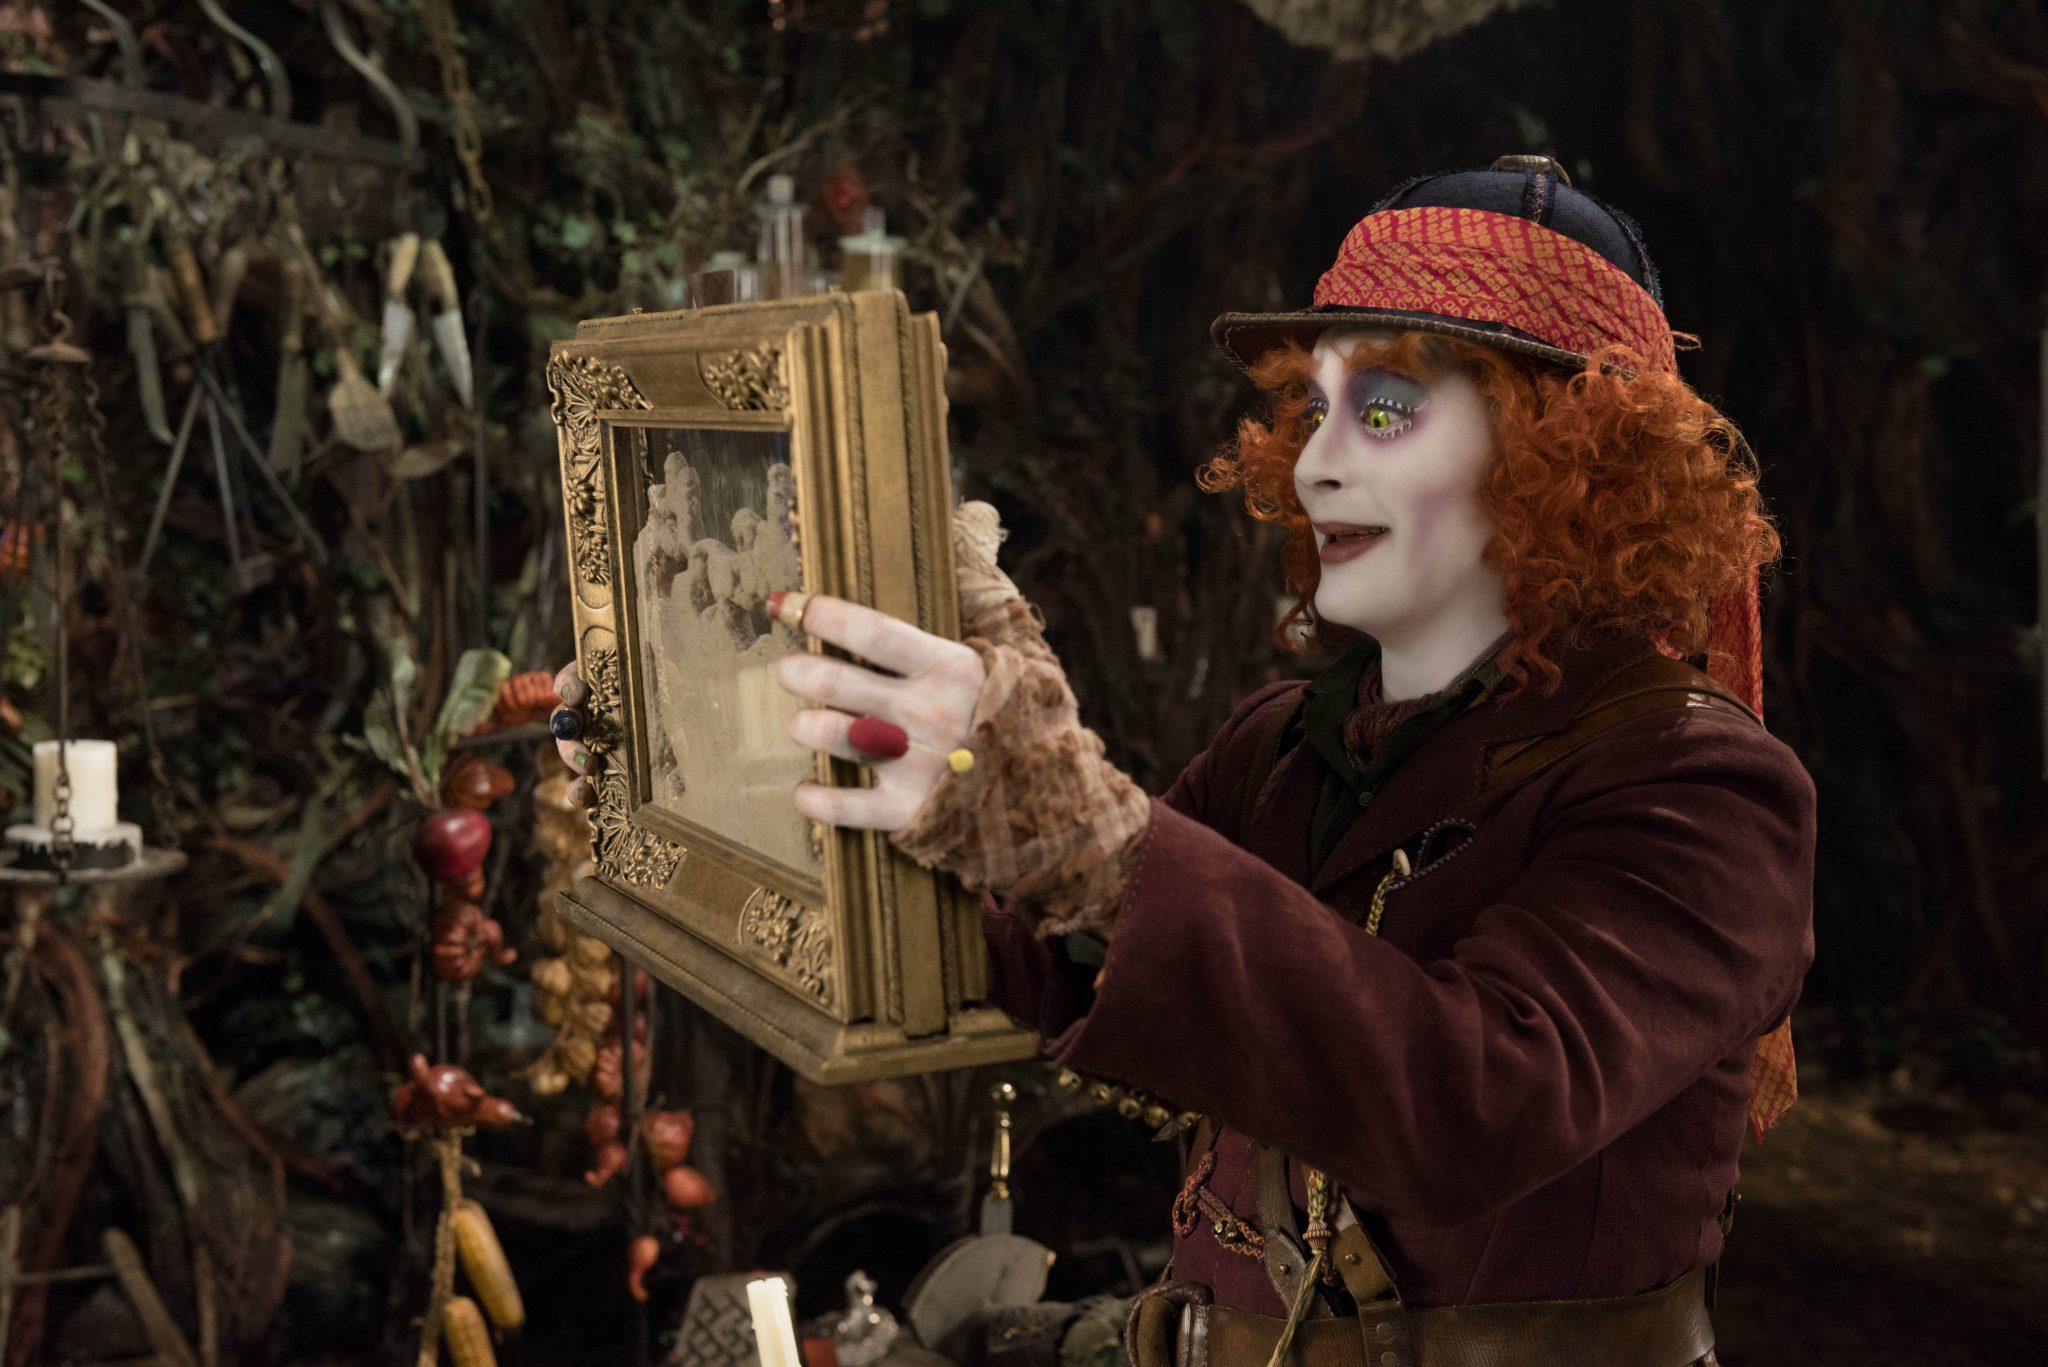 Johnny Depp Surprises Disneyland Guests As The Mad Hatter